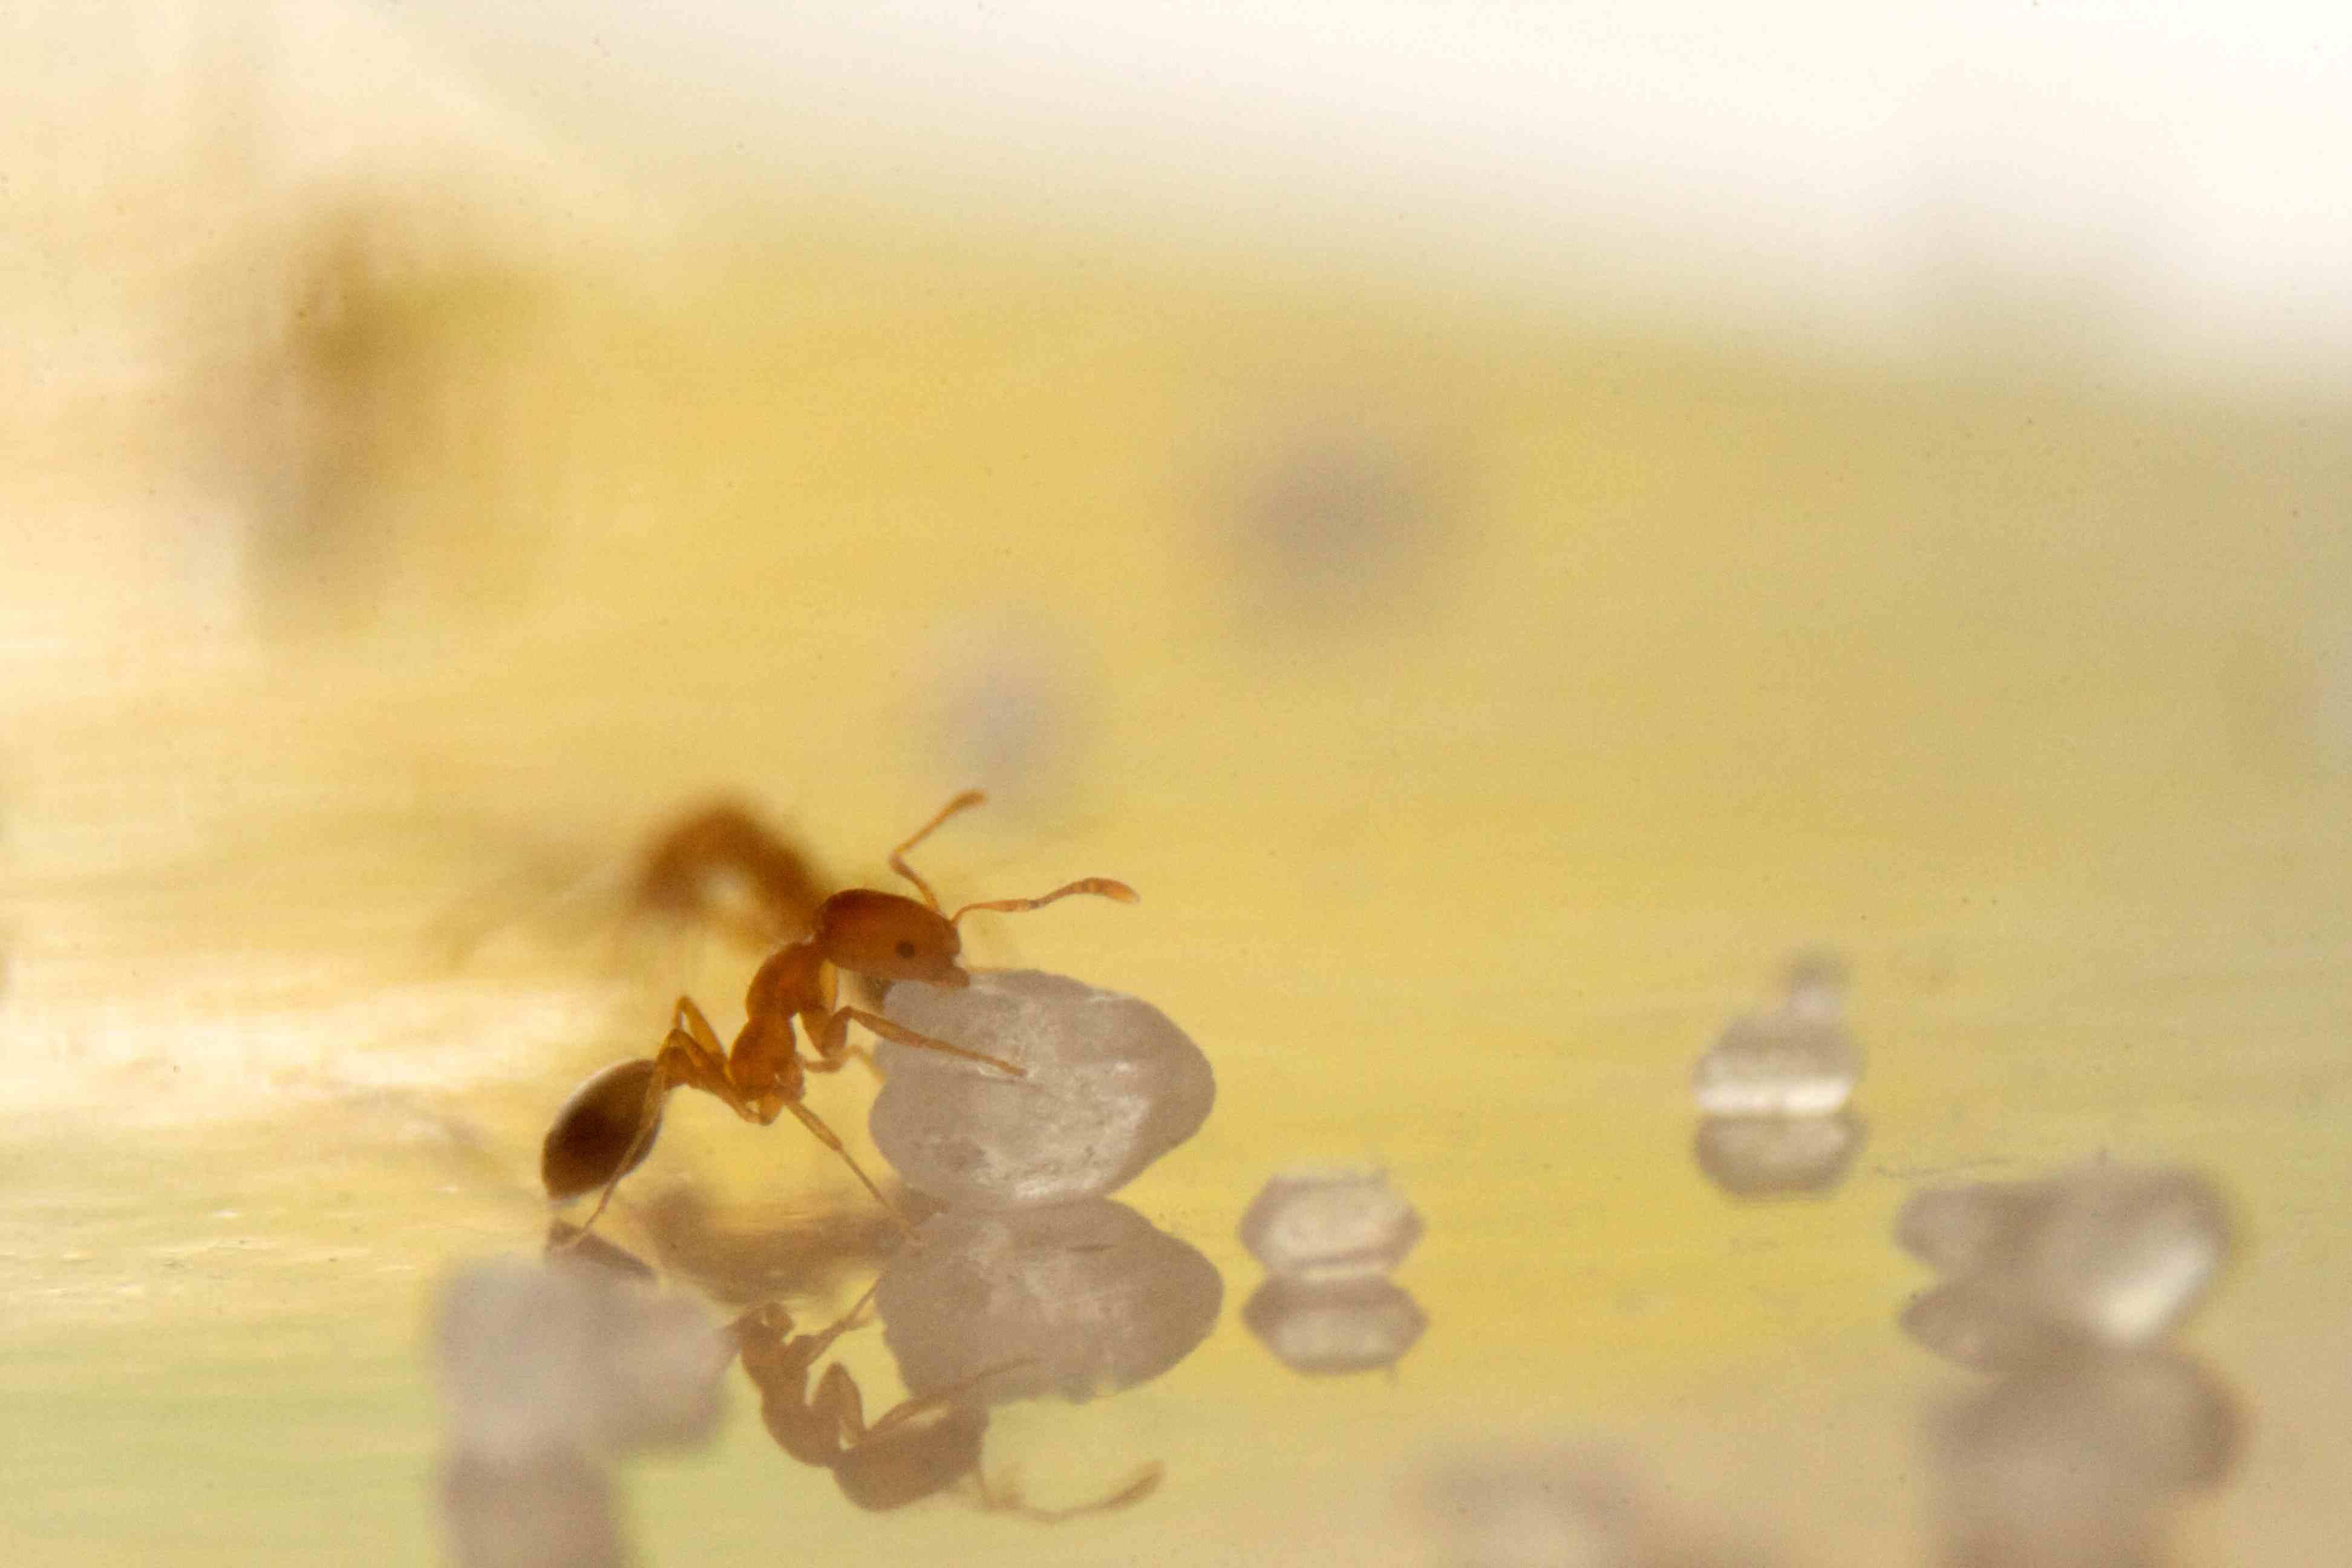 Image of Pharaoh ant